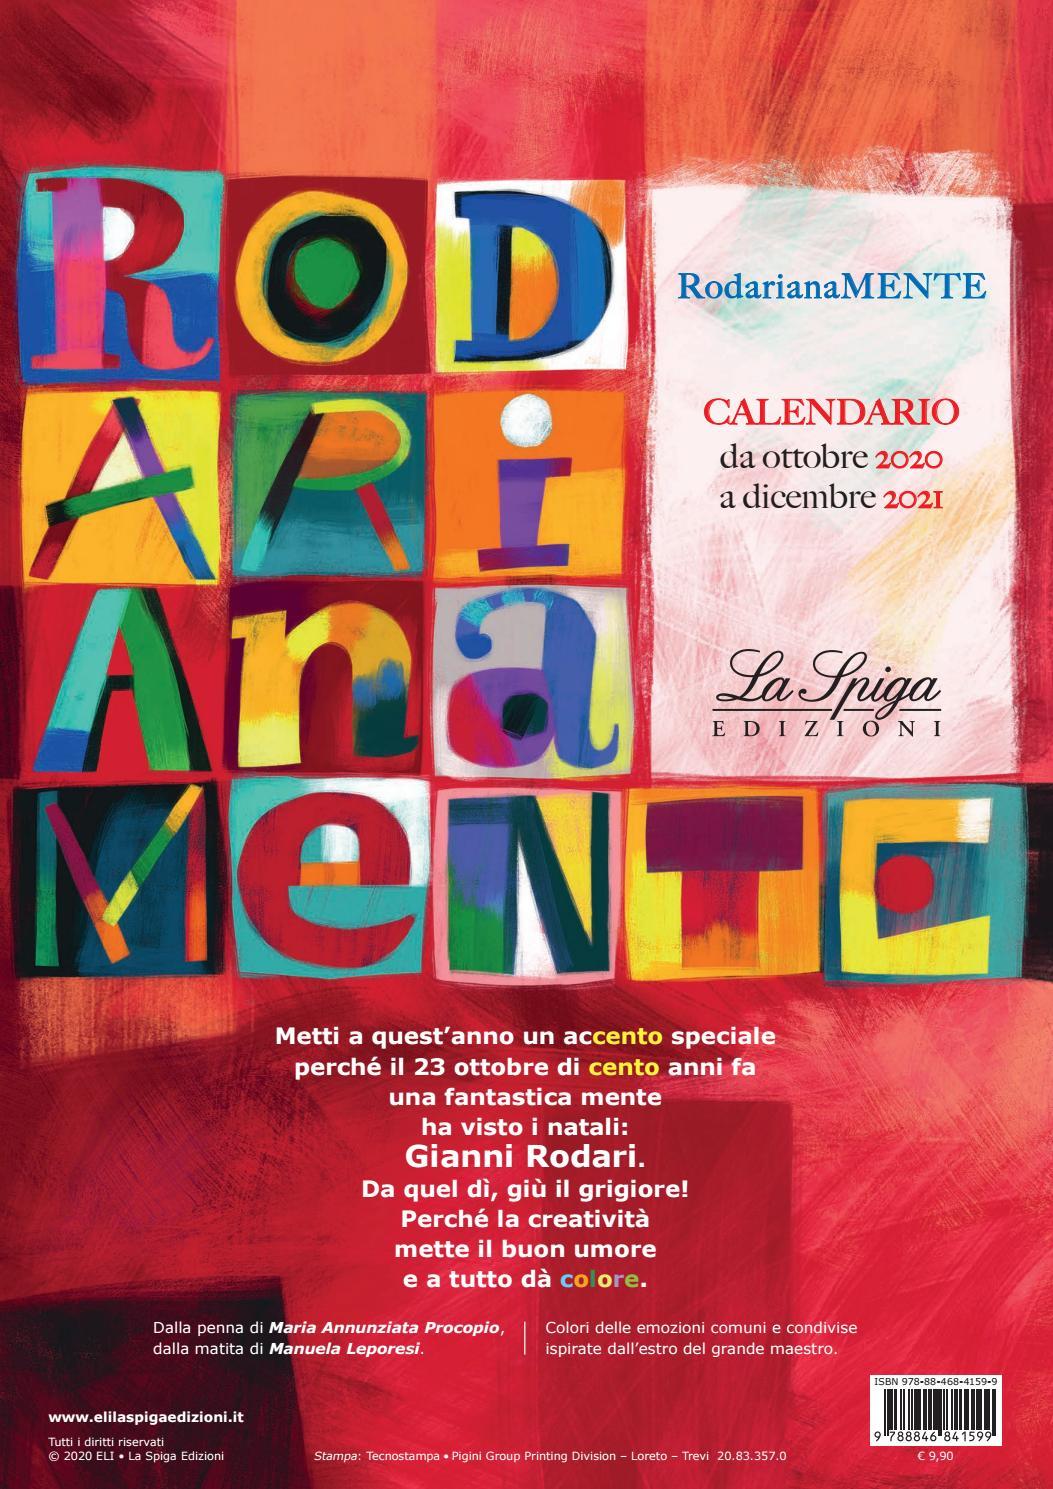 Calendario RodarianaMENTE 2020 2021 by ELI Publishing   issuu